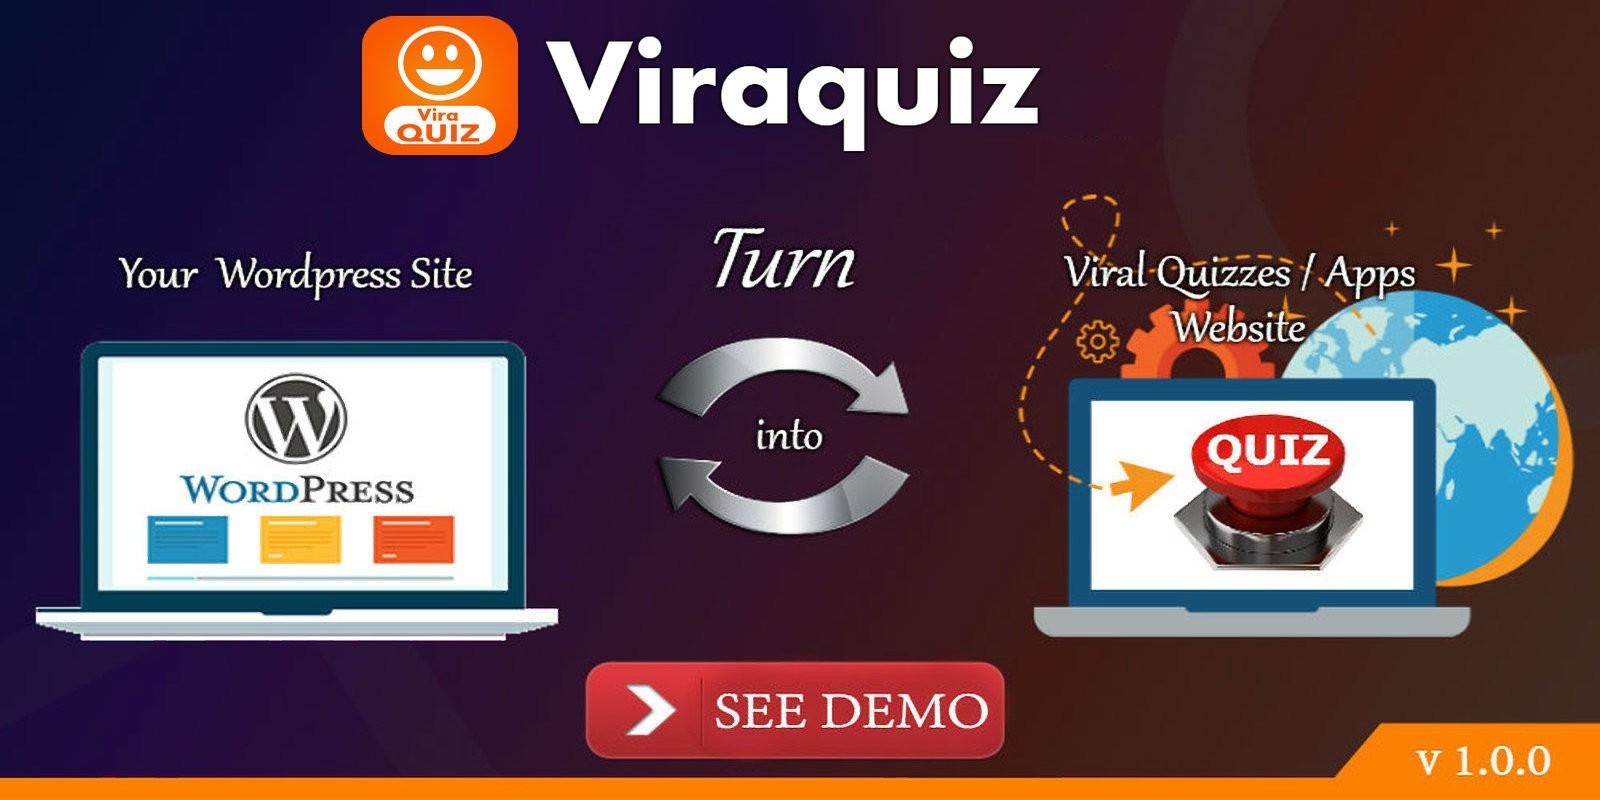 Viraquiz - Viral Facebook Quiz Wordpress Plugin